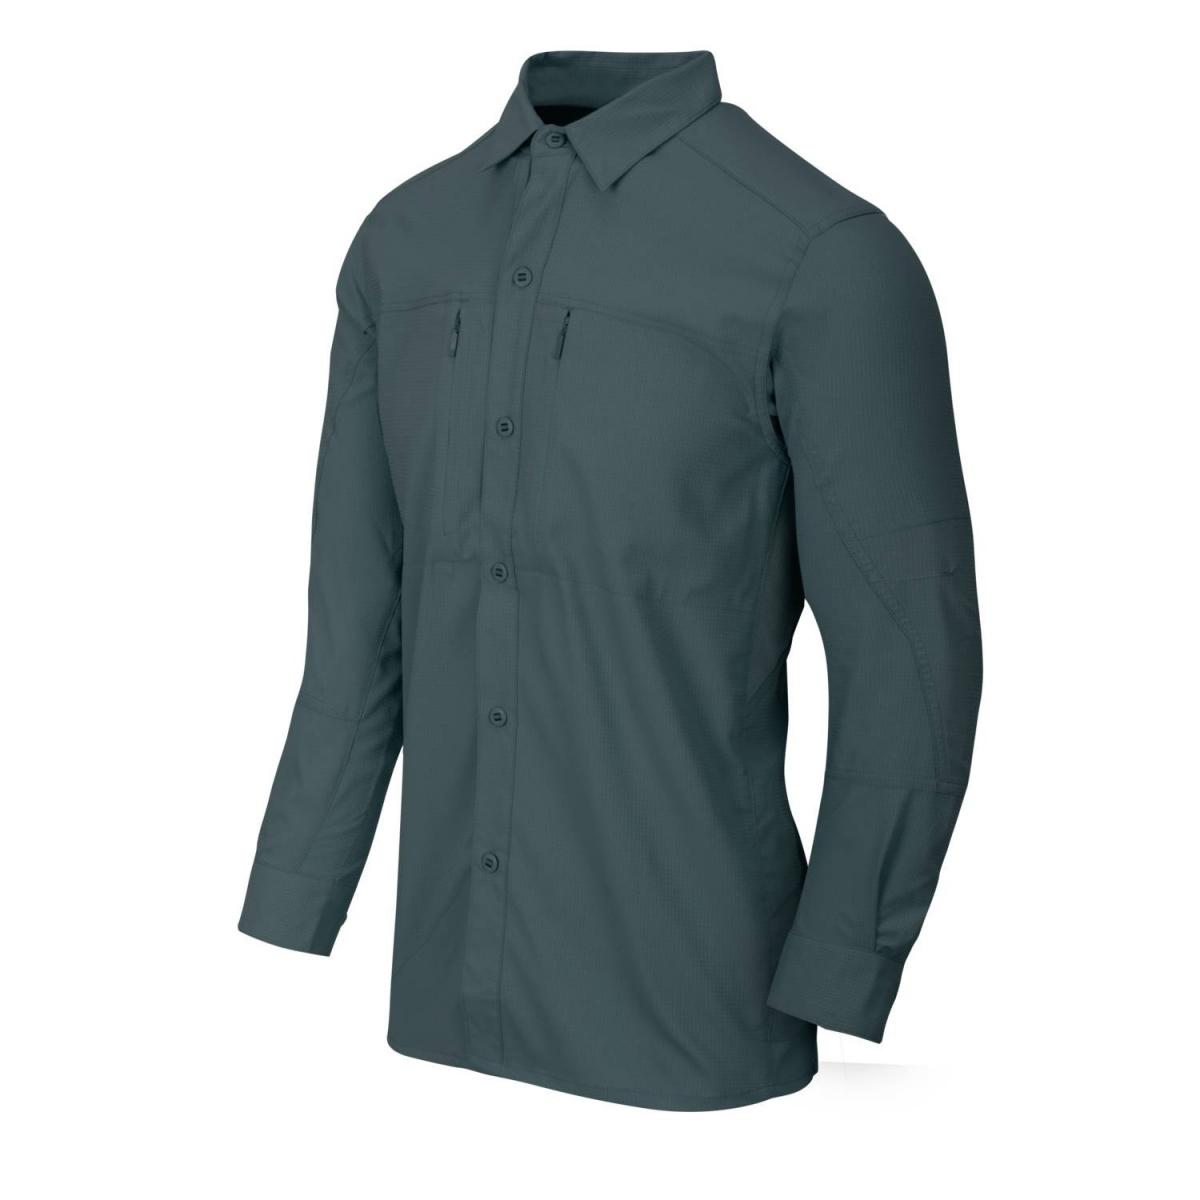 Košile TRIP dlouhý rukáv MARINE COBALT - zvìtšit obrázek